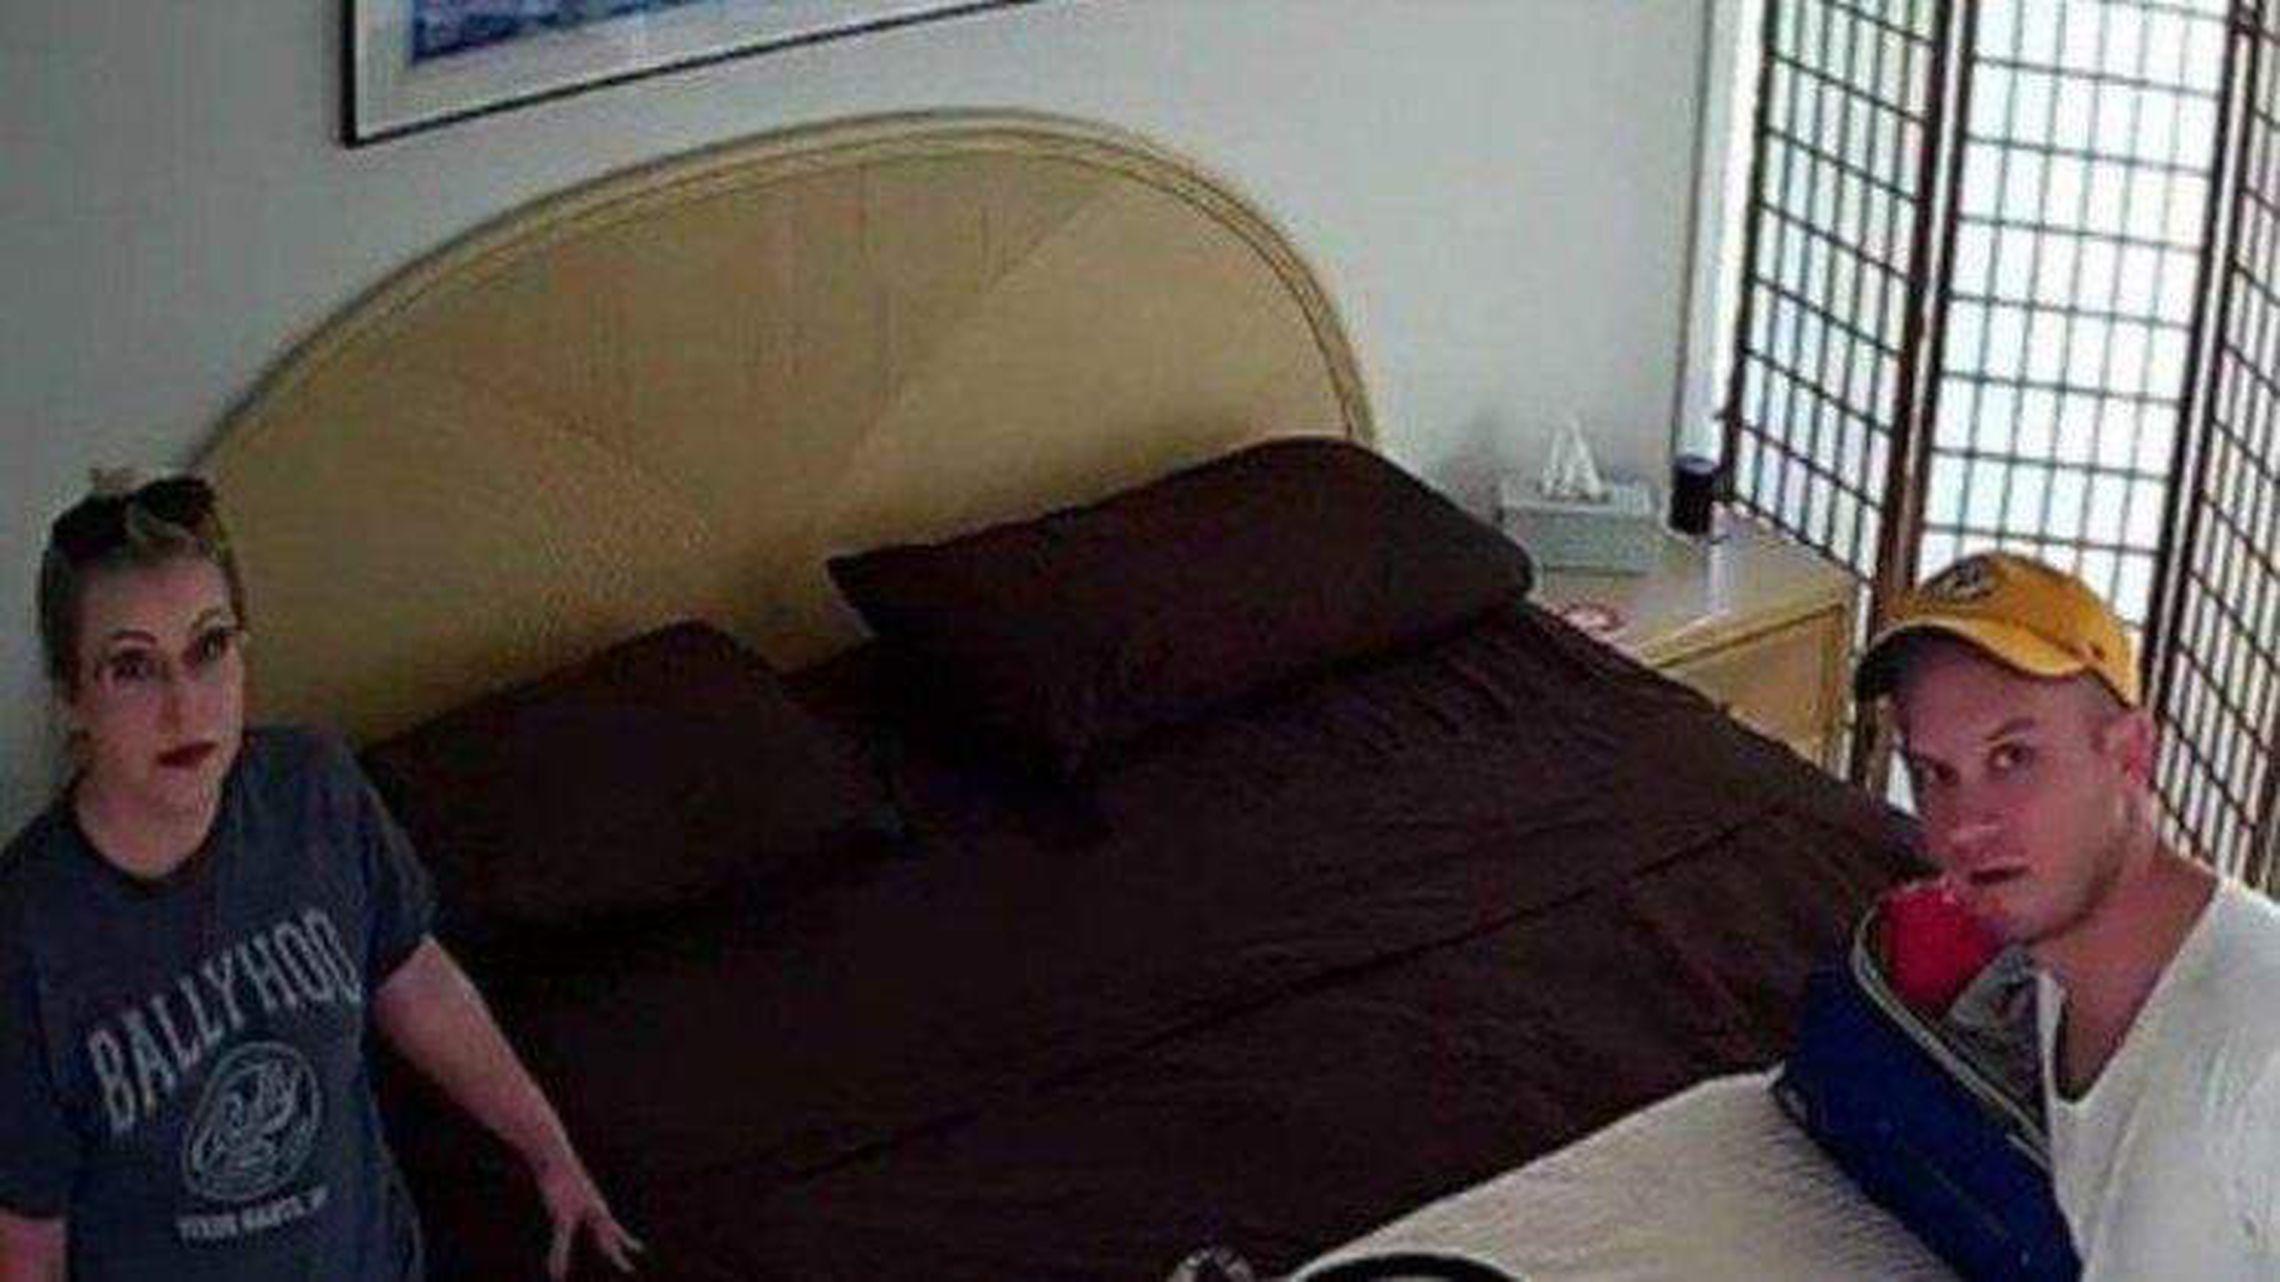 Airbnb Renters Find Hidden Camera In Bedroom Of Longboat Key Condo